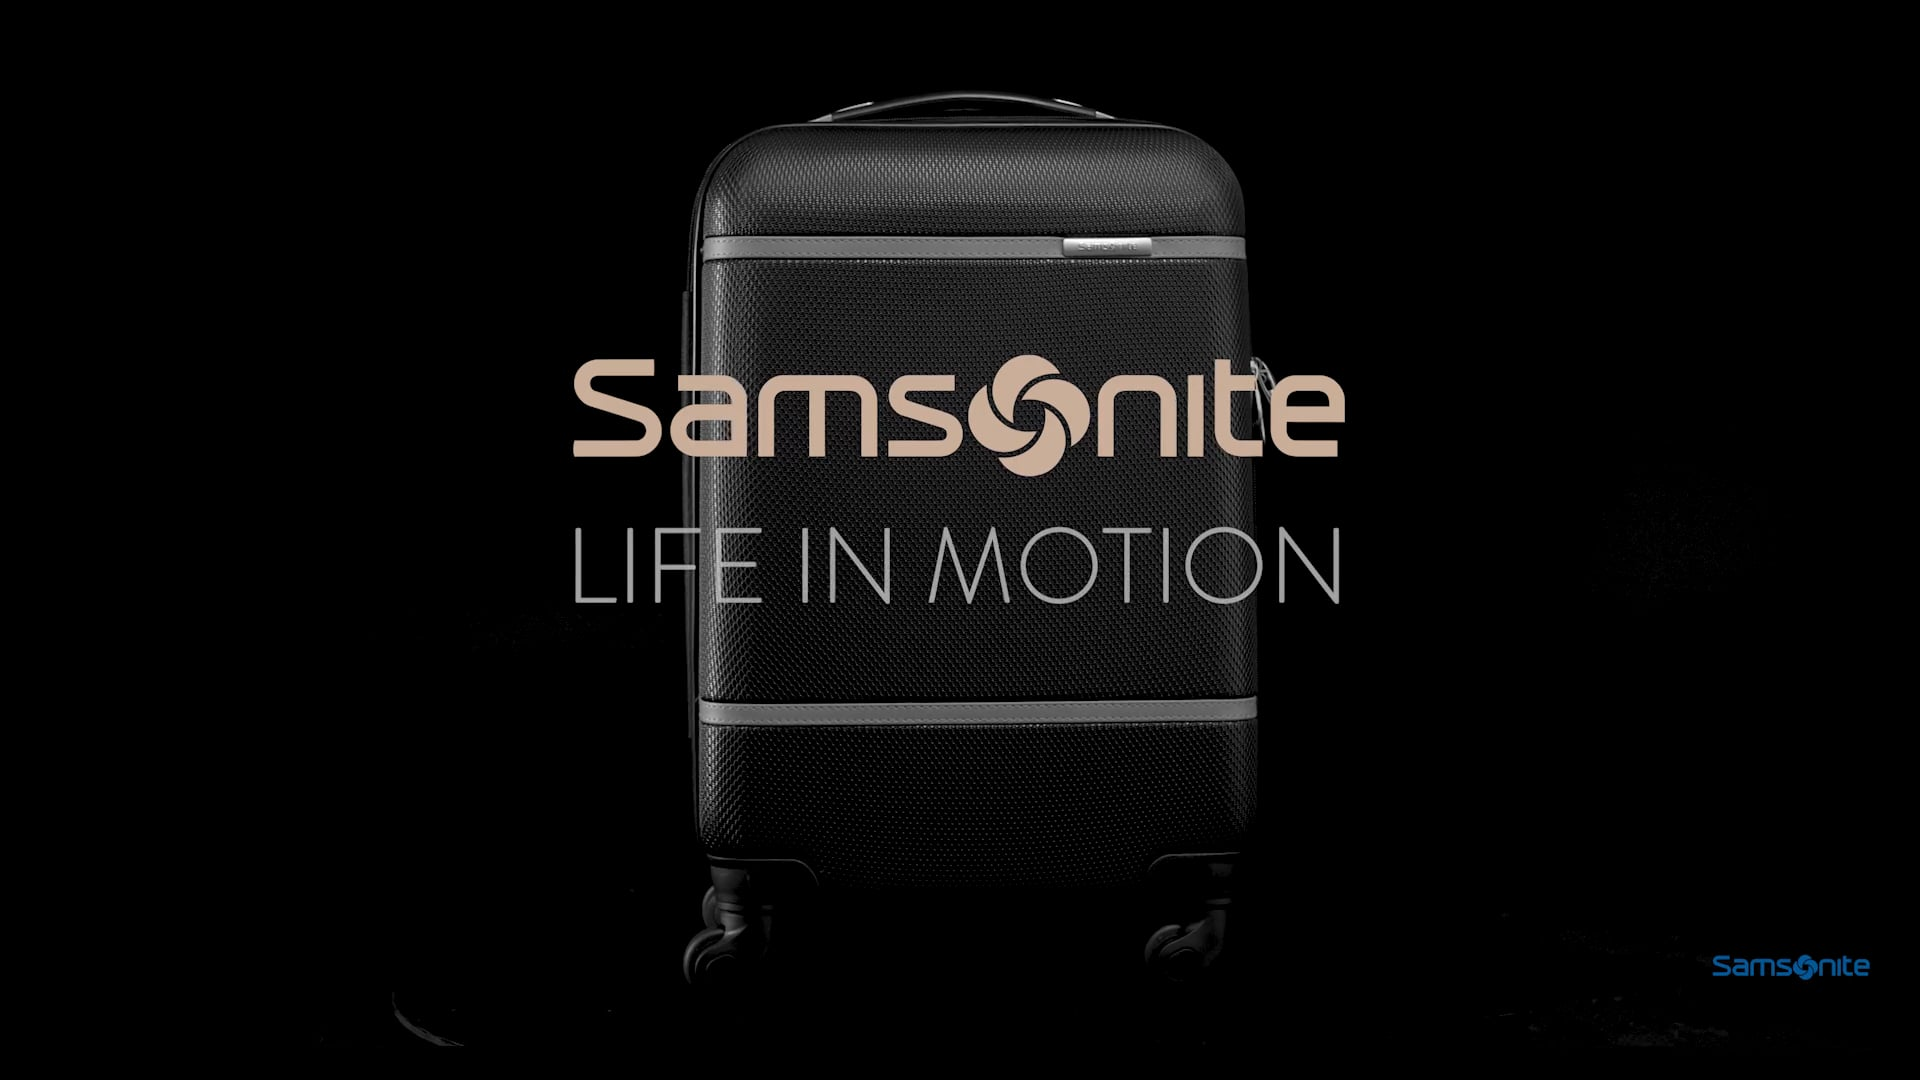 Samsonite Portfolio Video